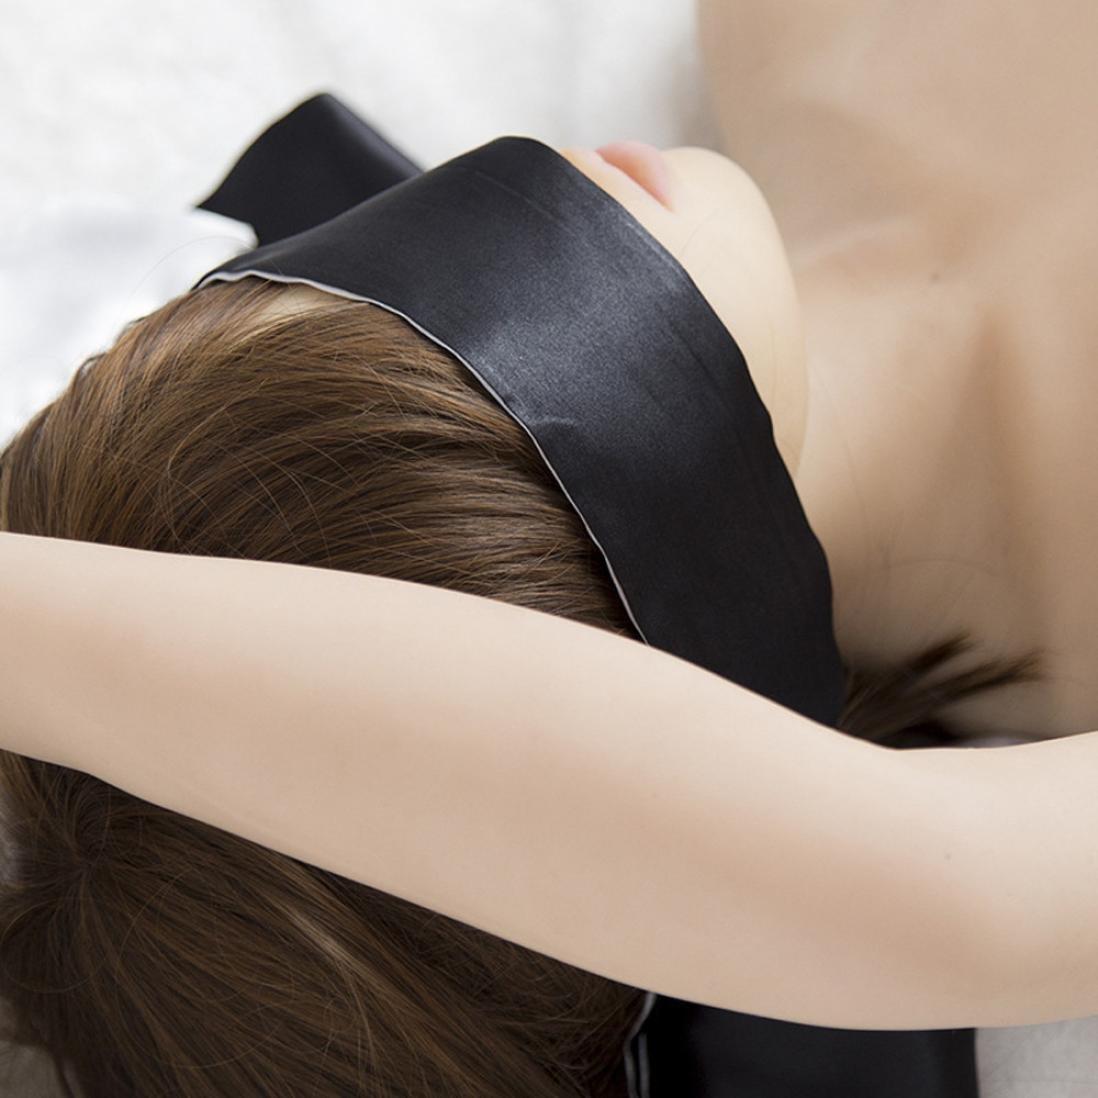 Limpieza! Daoroka Sex Juguetes para Parejas SM Bondage Eyes Patch ...